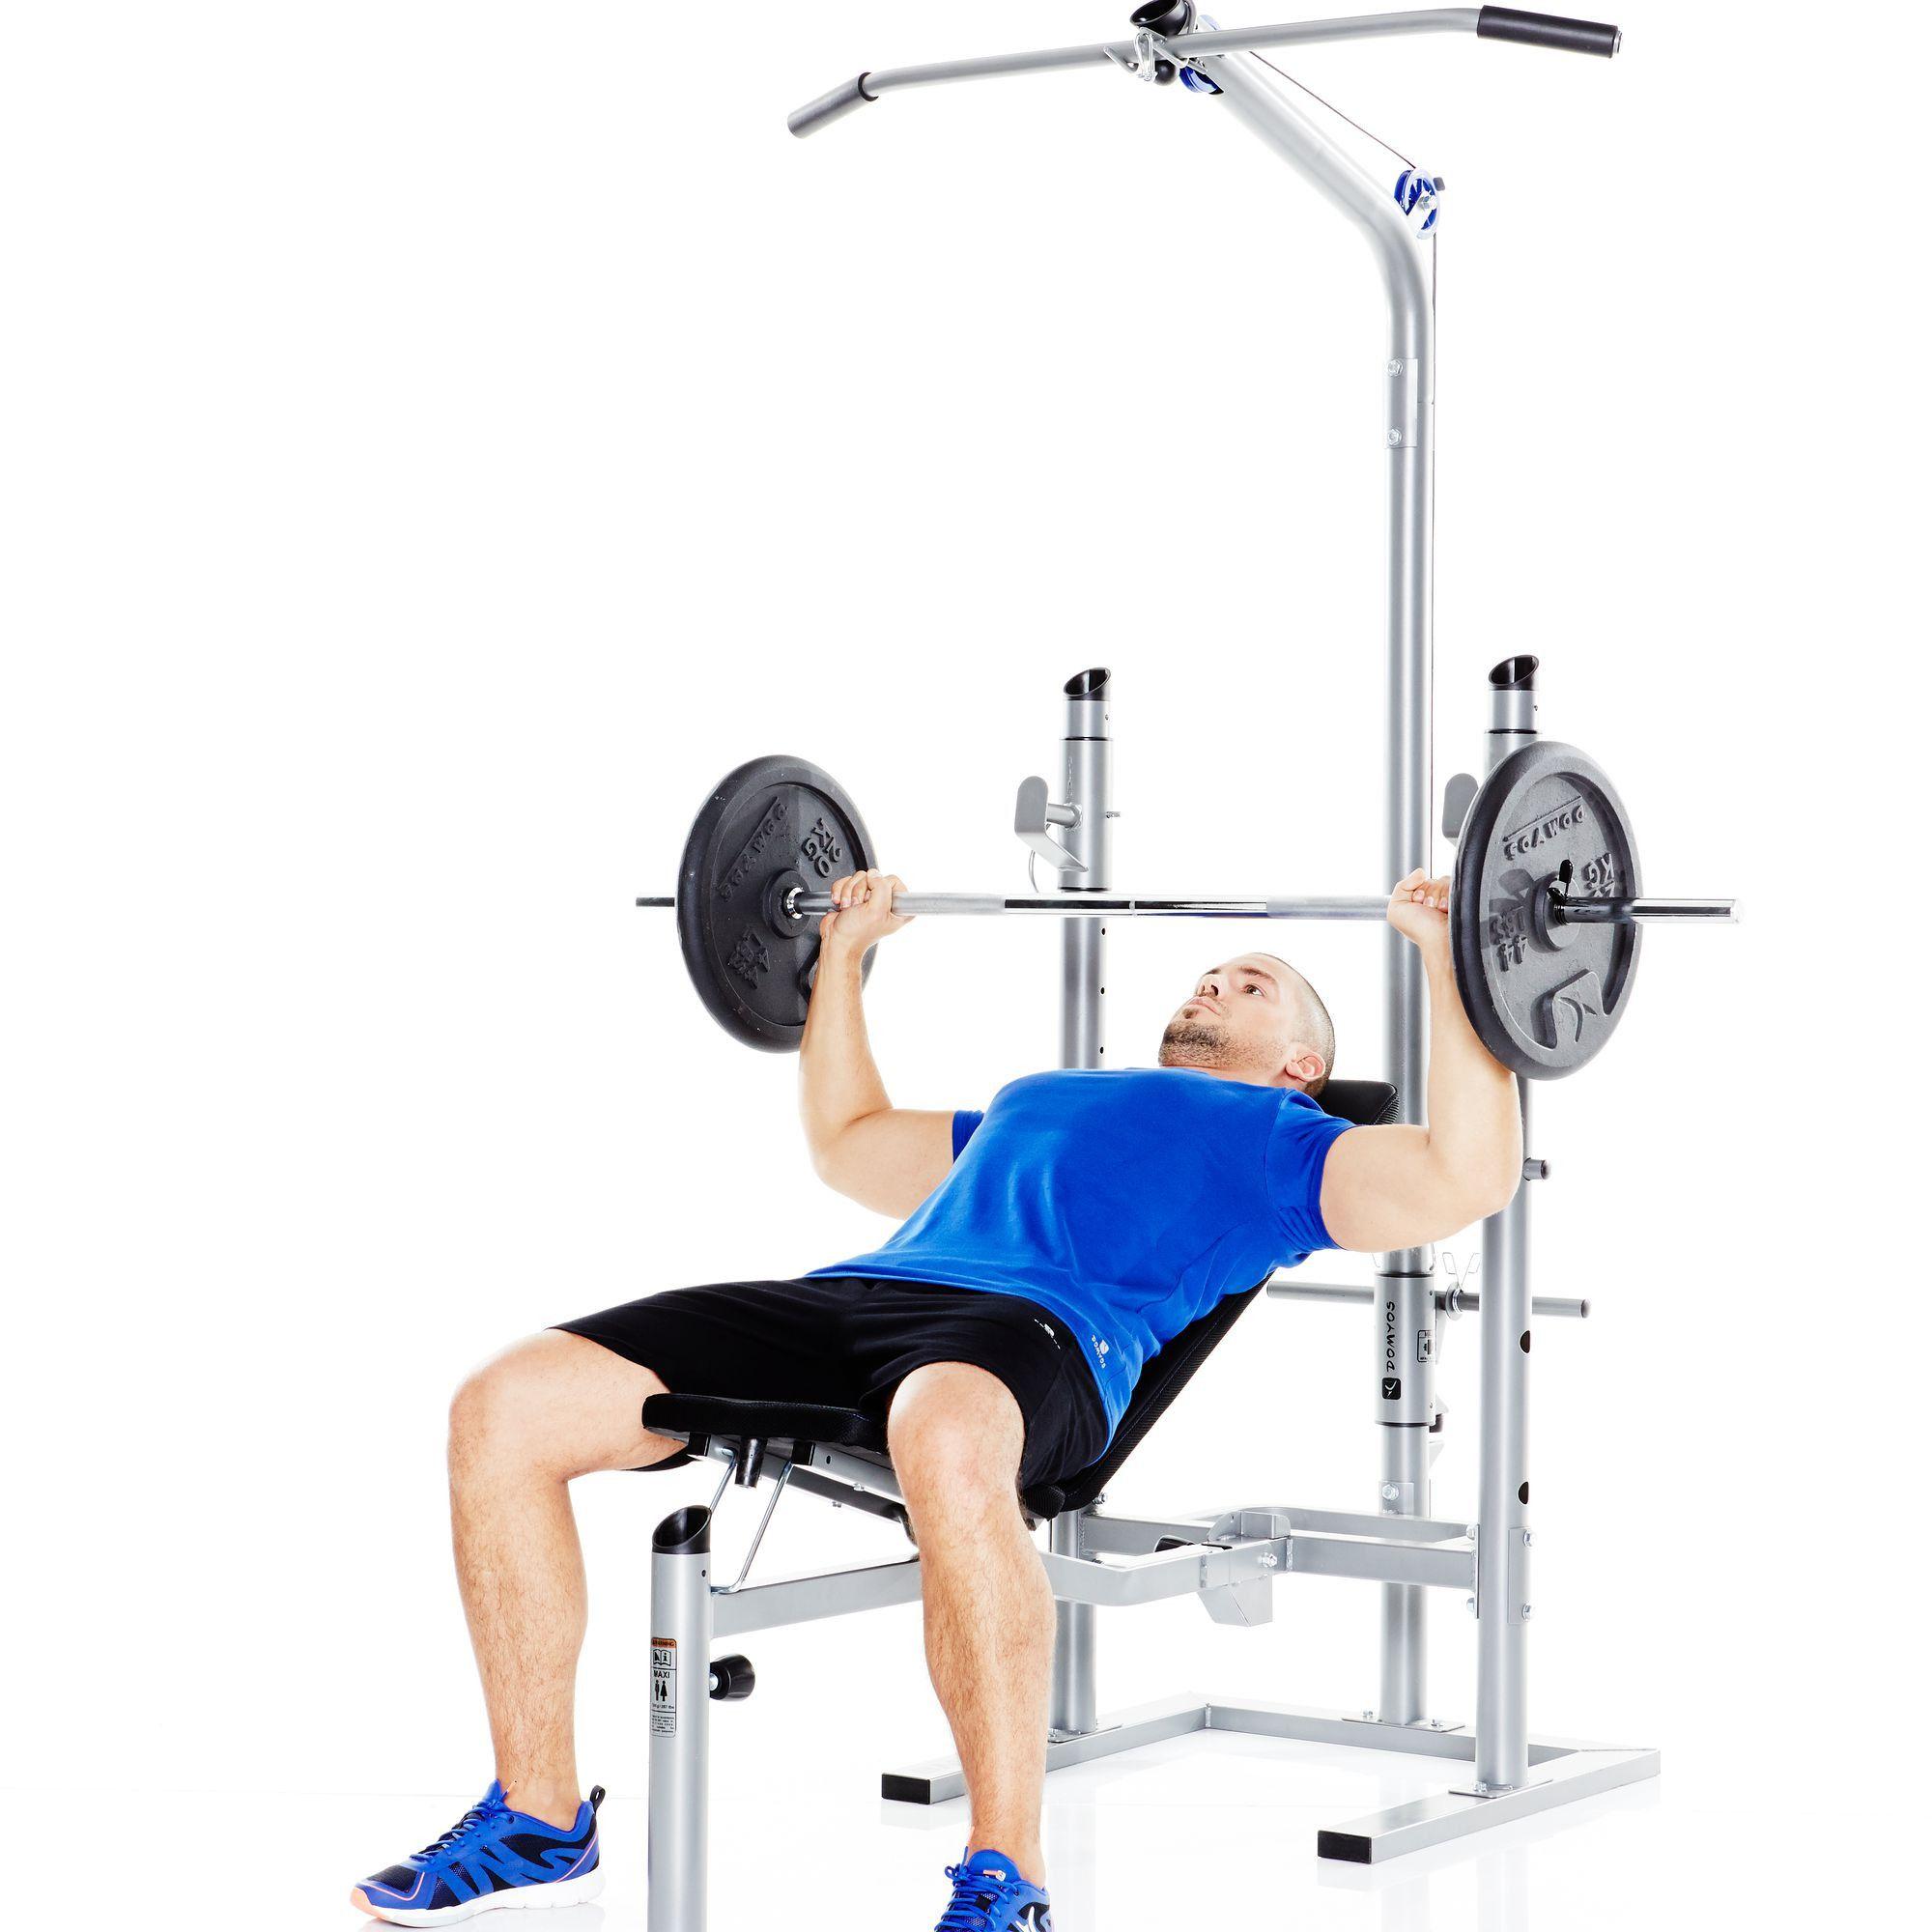 Banc De Musculation Domyos Hg 60 Banc De Musculation Domyos Hg 60 Fukuoka Fukuoka Japan Fukuoka Banc De Musculation Occasion Row Machine Gym Equipment Sports